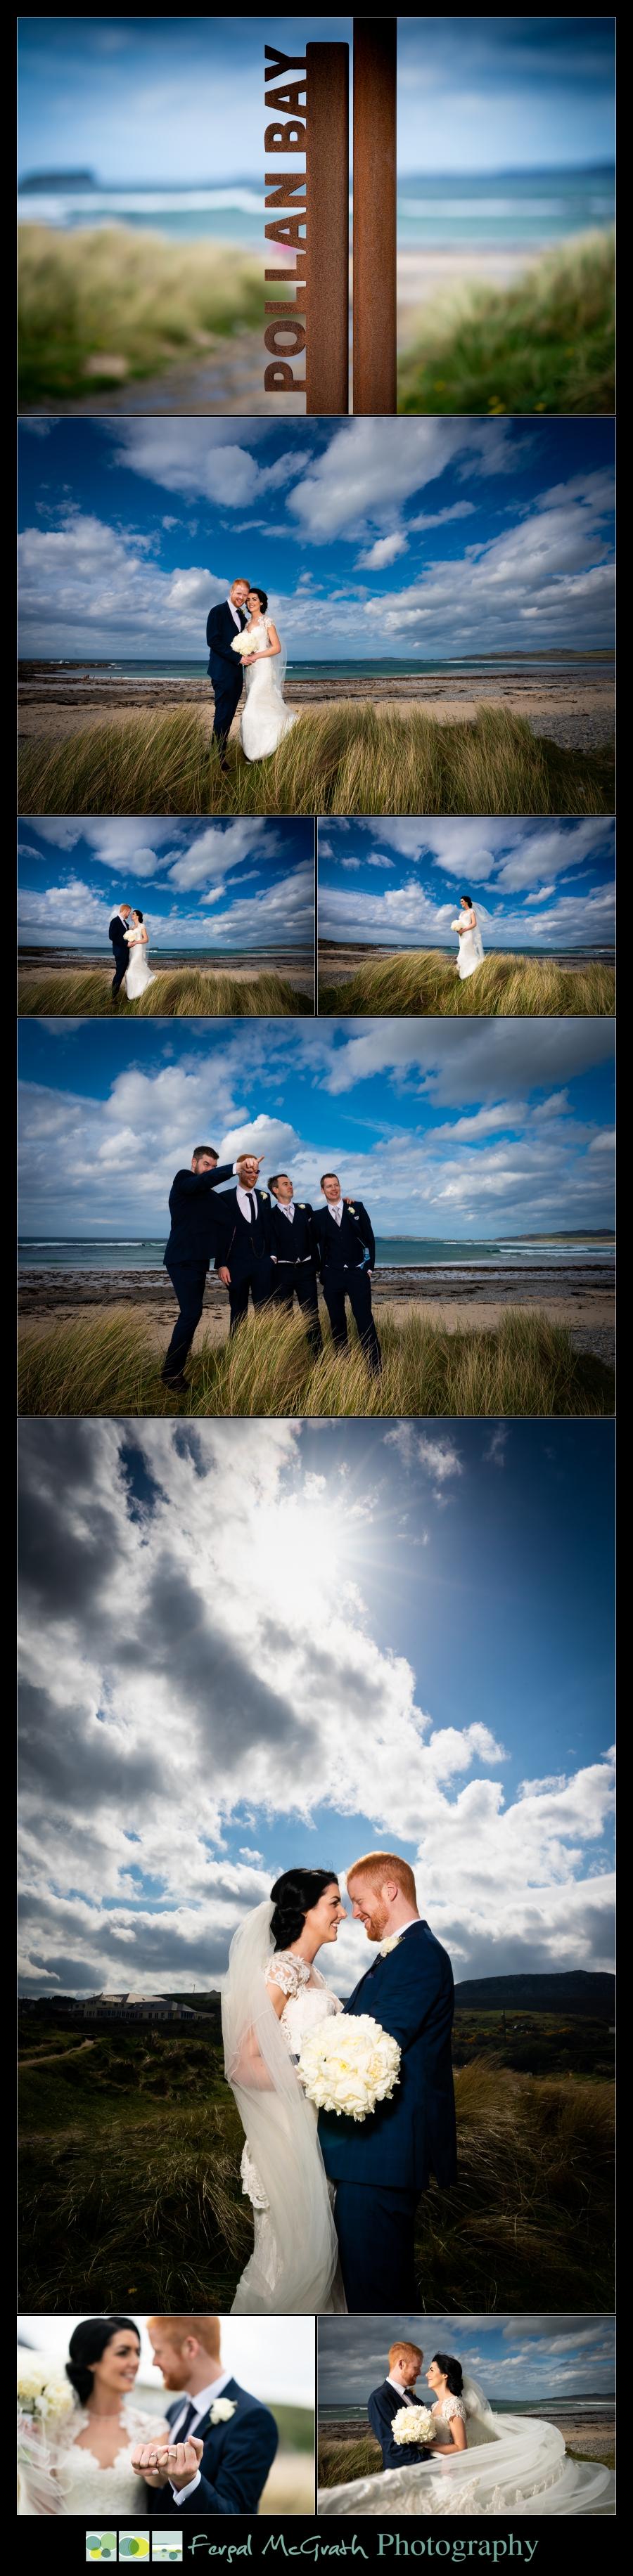 Ballyliffin Lodge Hotel Weddings bride and groom on pollen bay beach